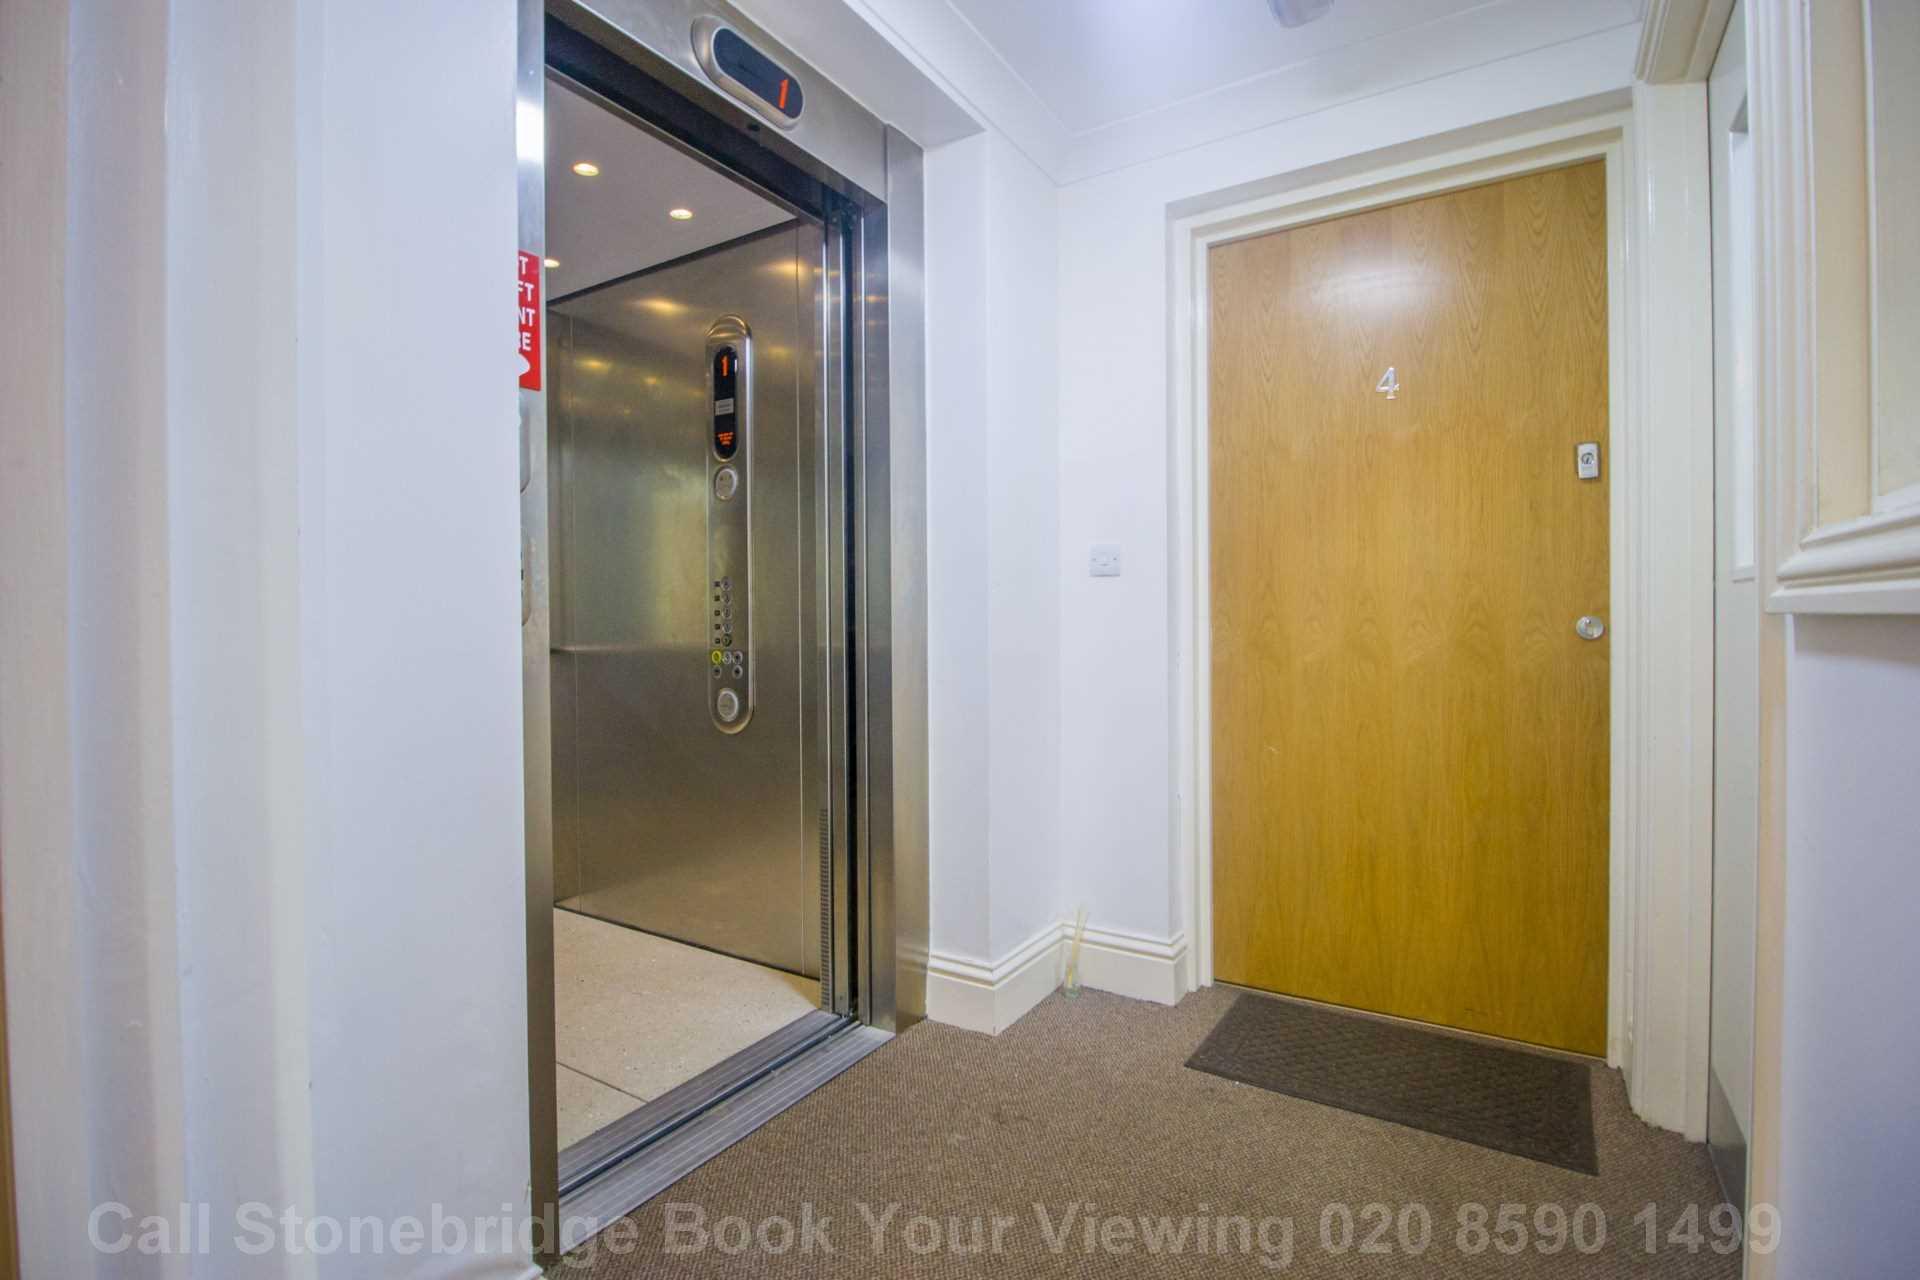 Fari Court, Tower Mews, London E17, Image 3